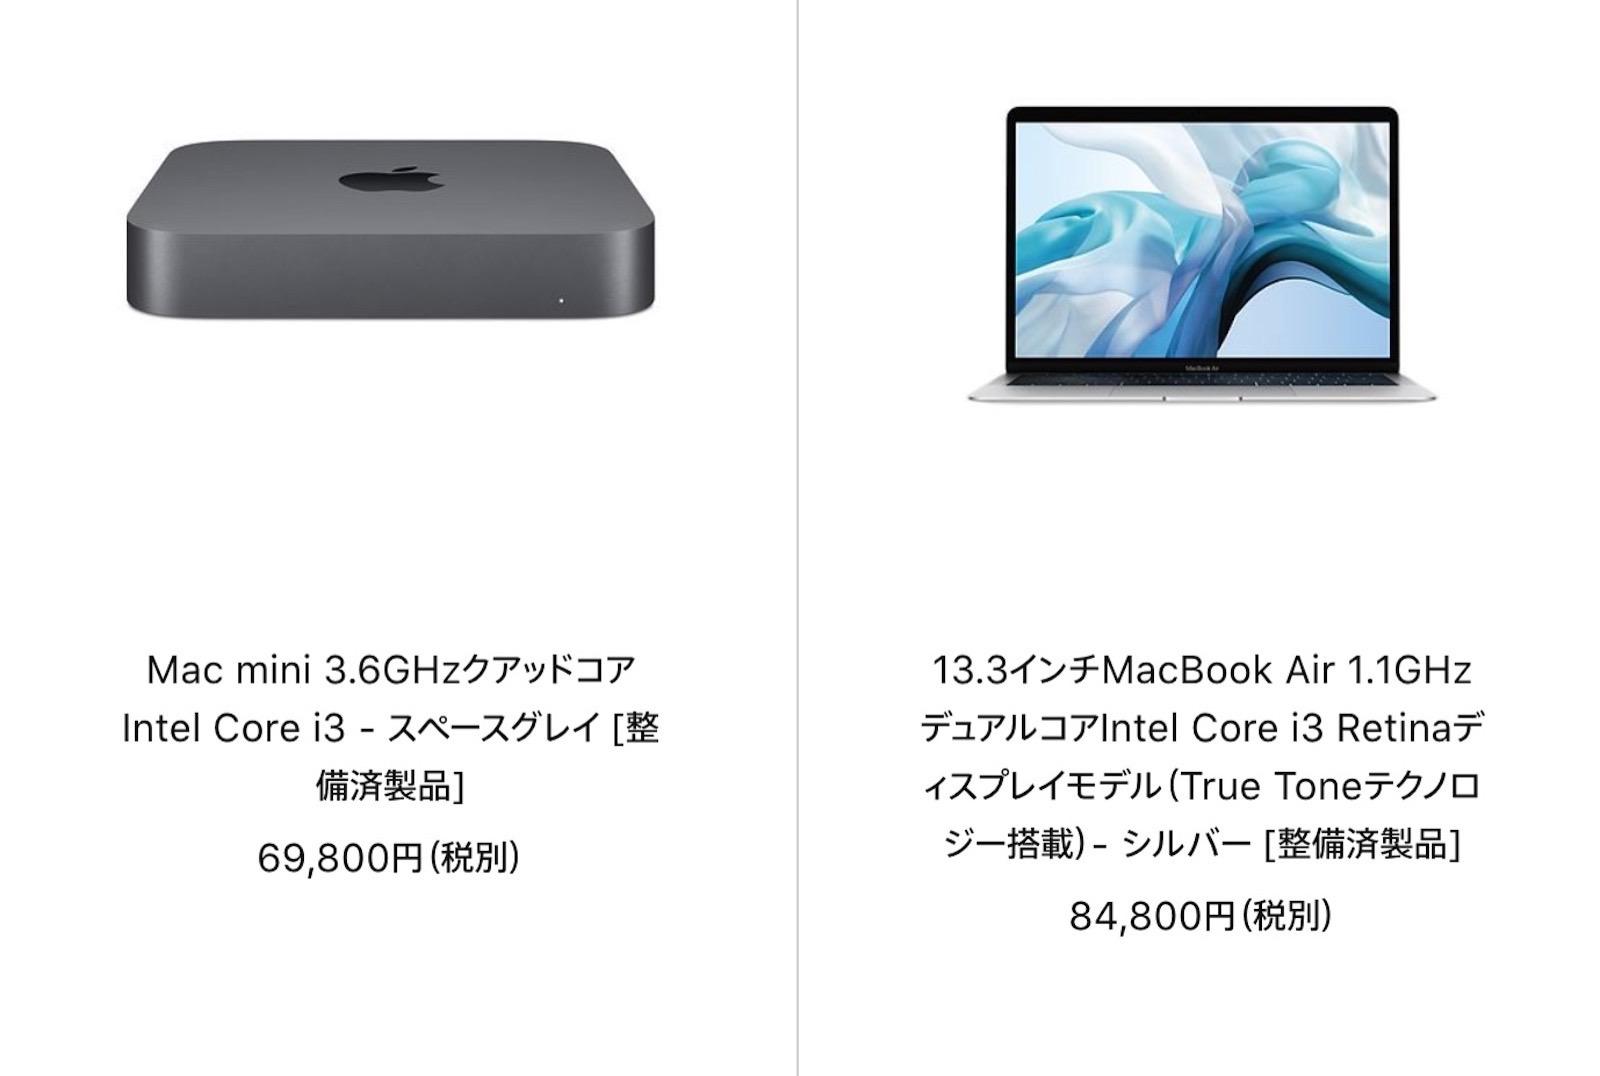 Refurbished macs 2021 01 27